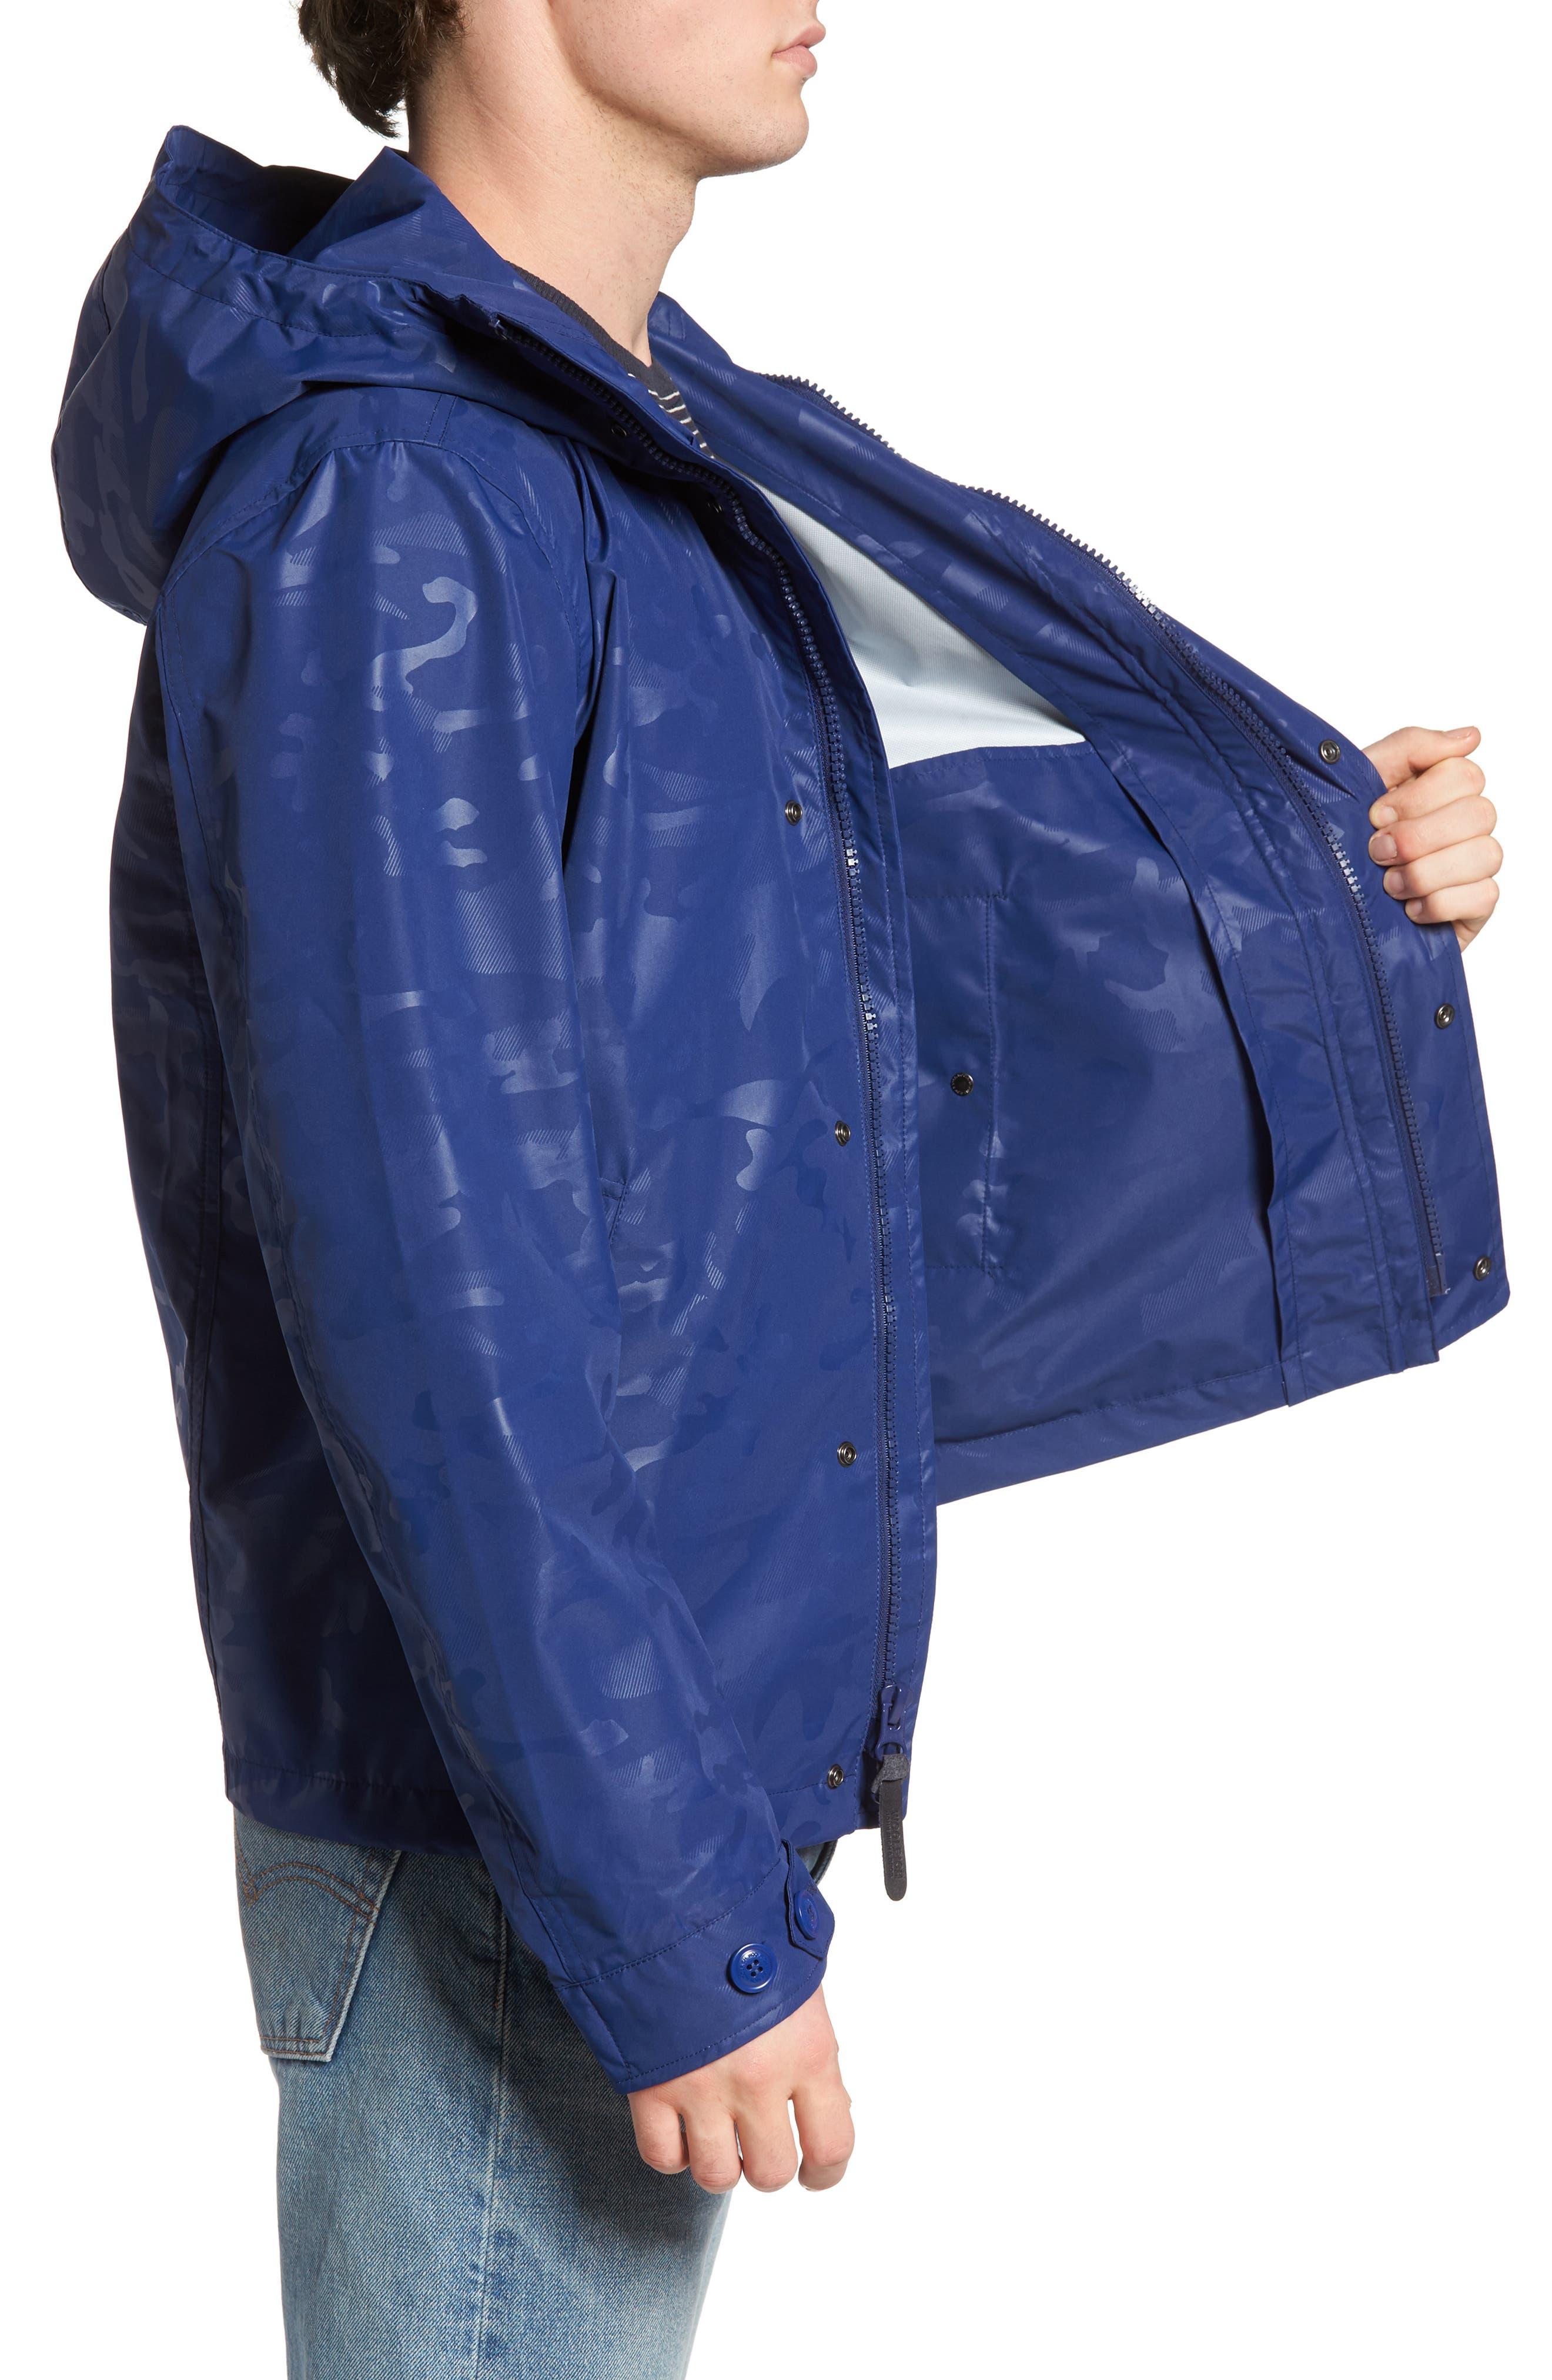 Camou Rudder Waterproof Jacket,                             Alternate thumbnail 3, color,